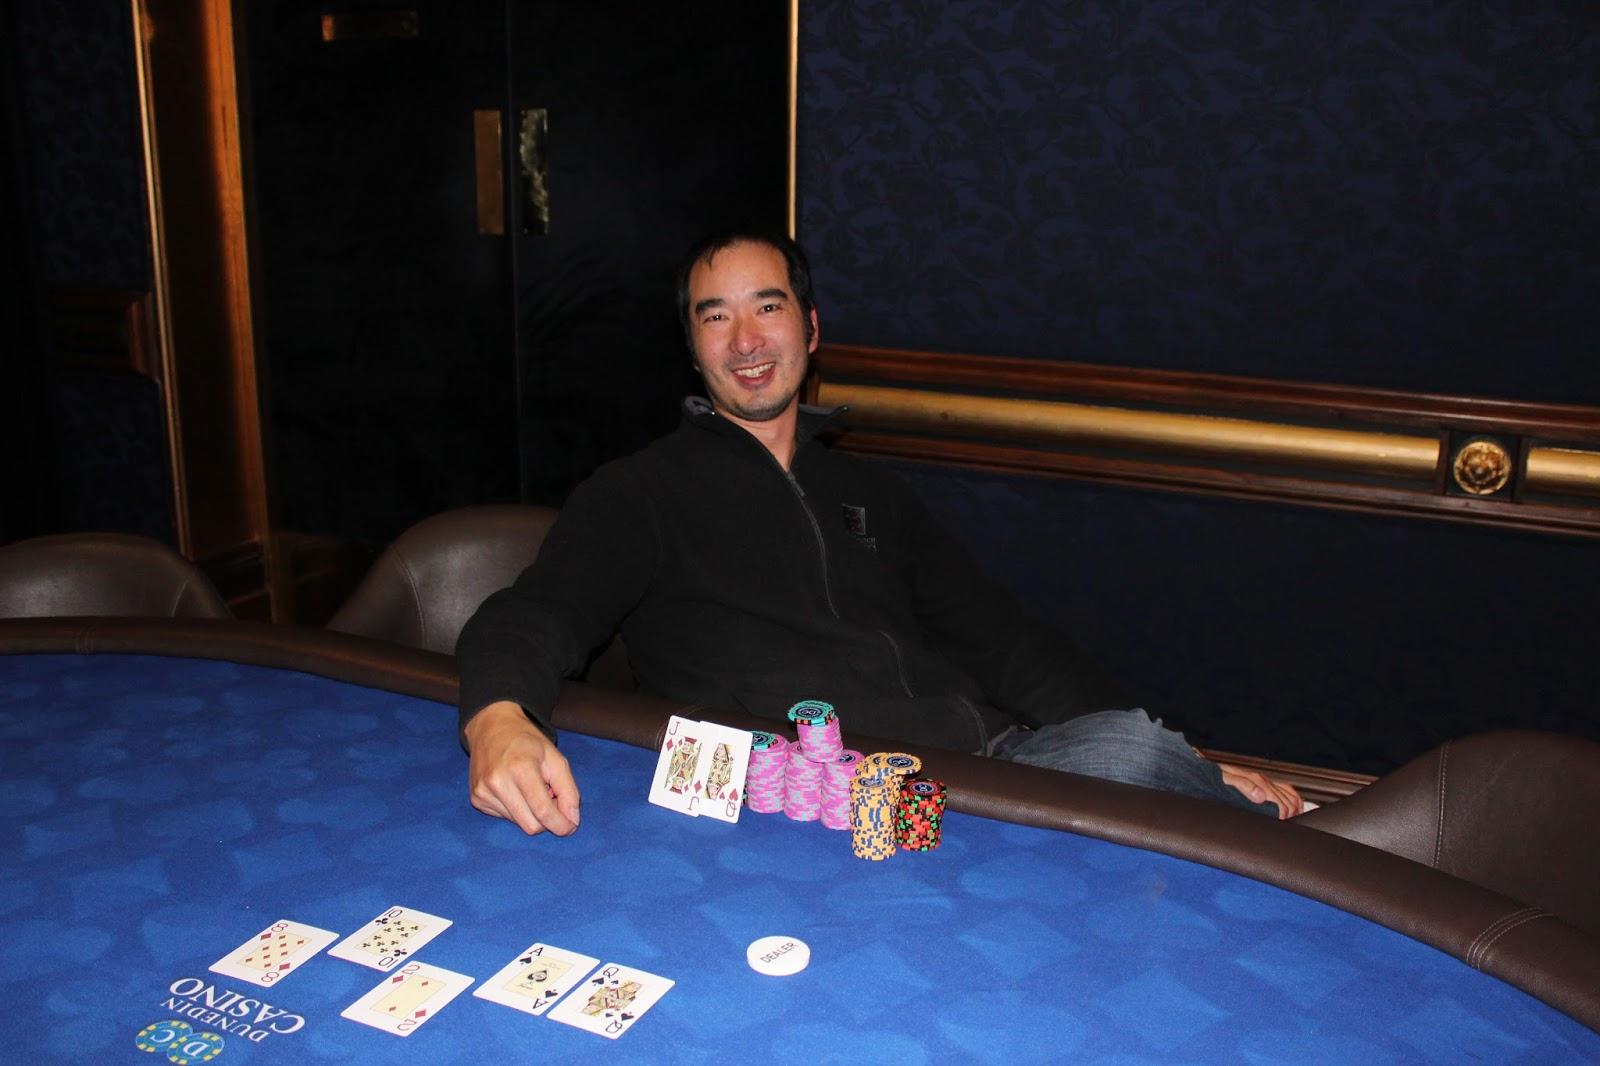 Dunedin Casino Poker Classic Chris Shum $ugar $hum $2000 holdem tournament